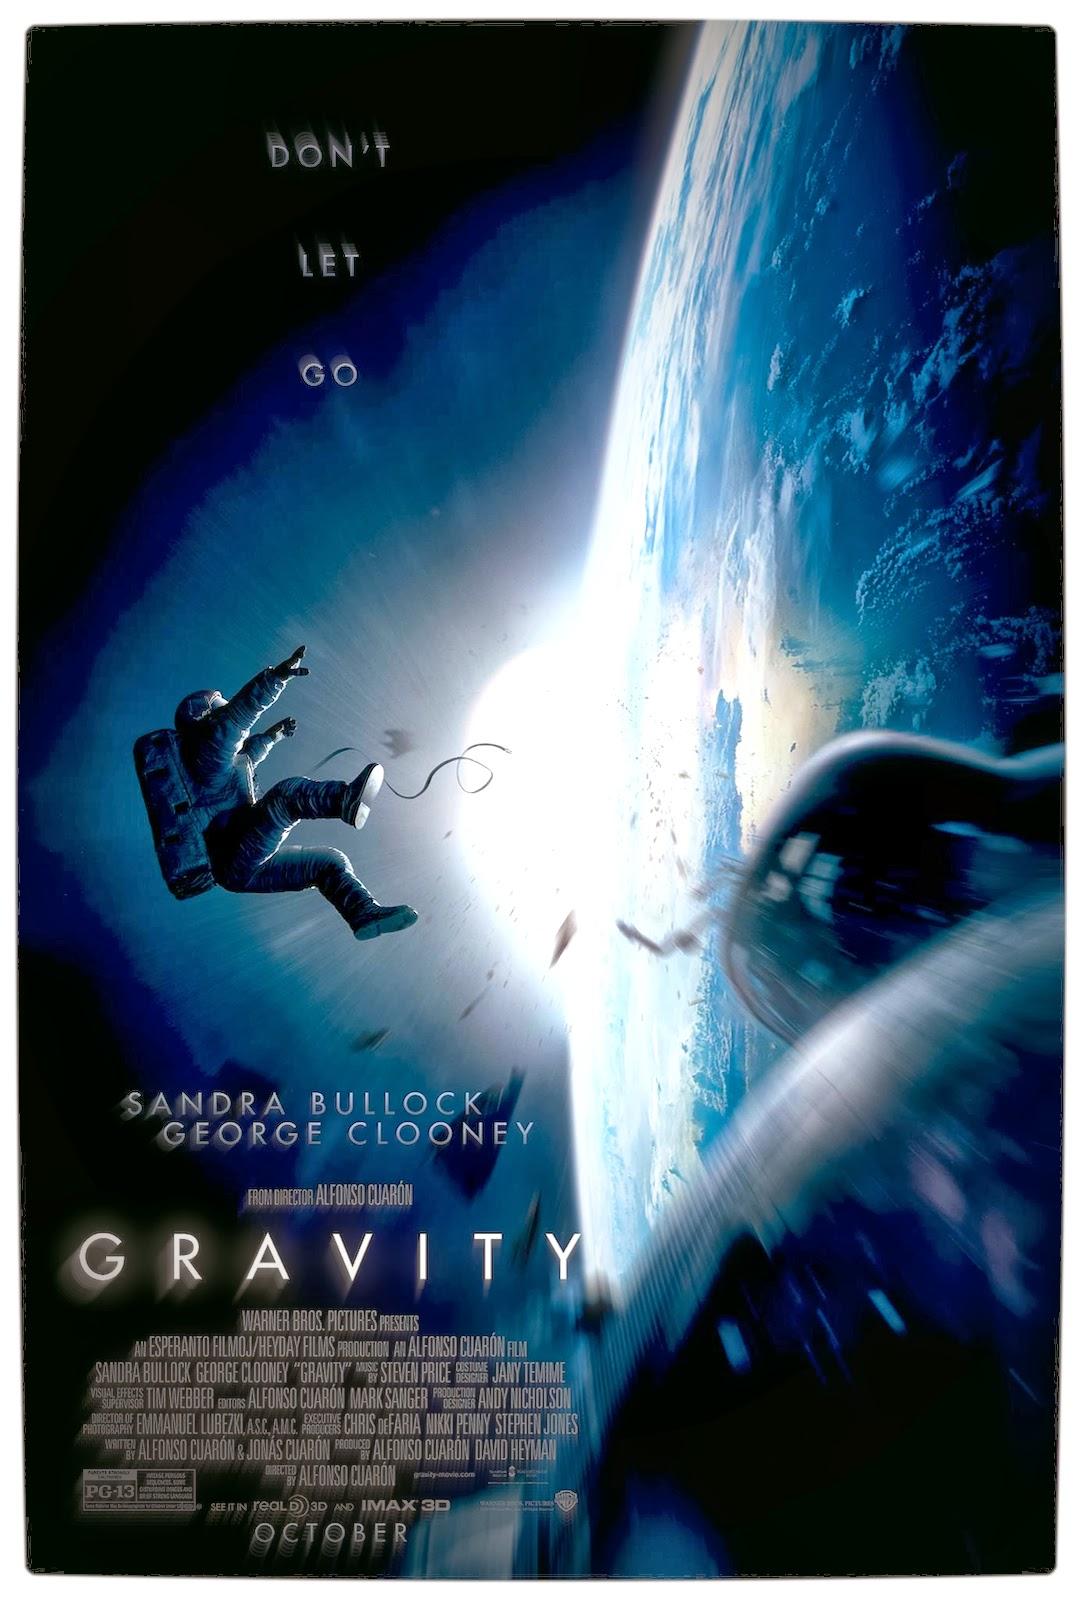 http://3.bp.blogspot.com/-b1HcS8J6Fog/UmKJ1hD4bLI/AAAAAAAAA1Y/dEyE5EY5ZeY/s1600/Vamers-FYI-Movies-Gravity-Official-Poster.jpg